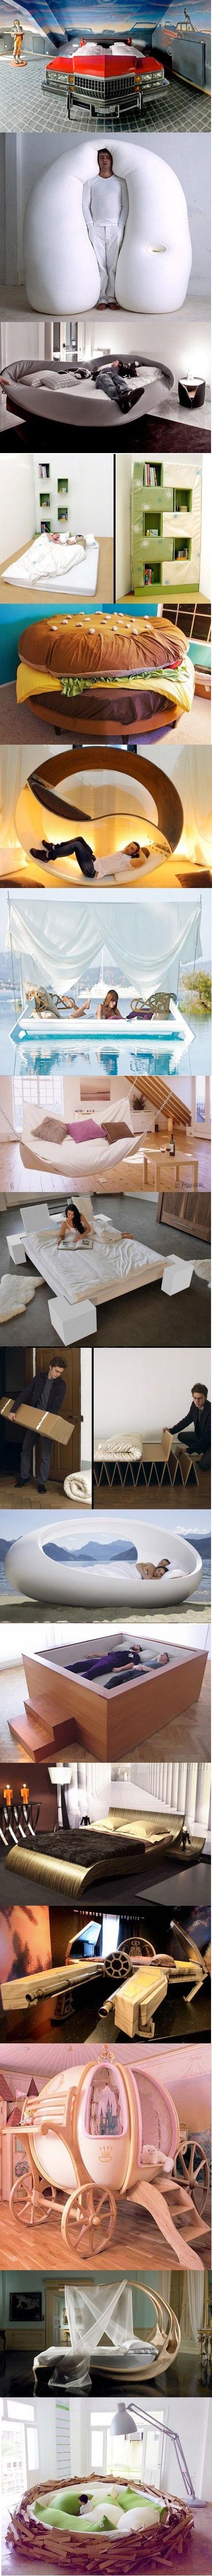 Creative Bed Design